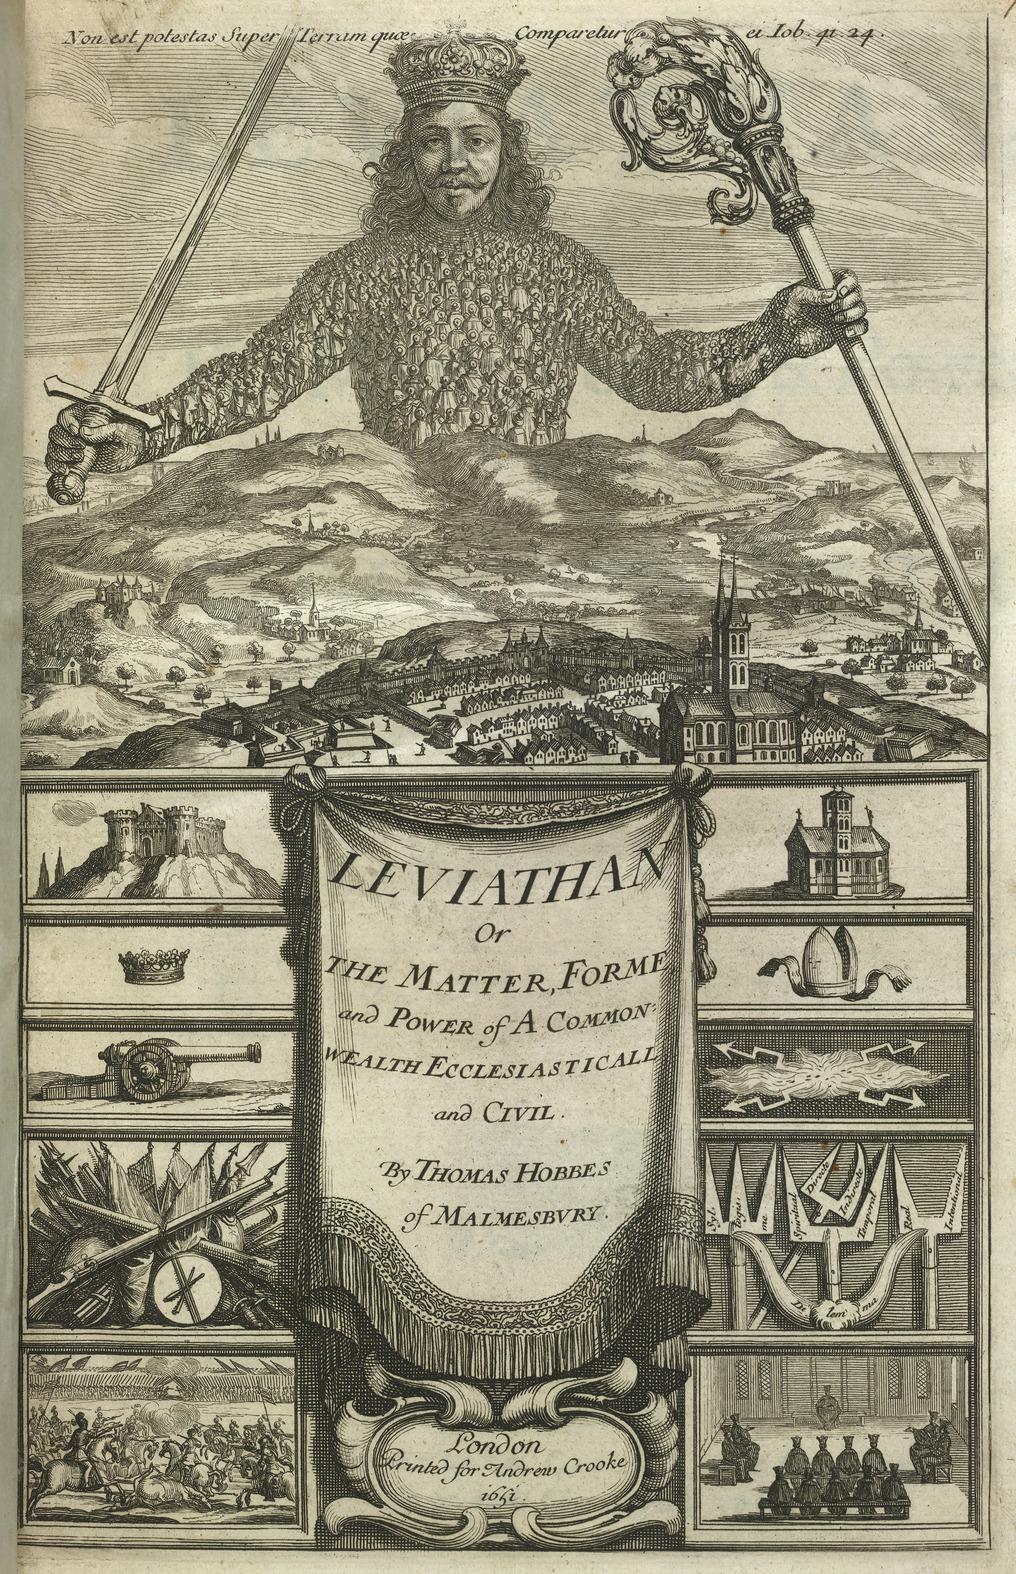 Leviathan - Hobbes%27 Leviathan (1651), title page - BL.jpg